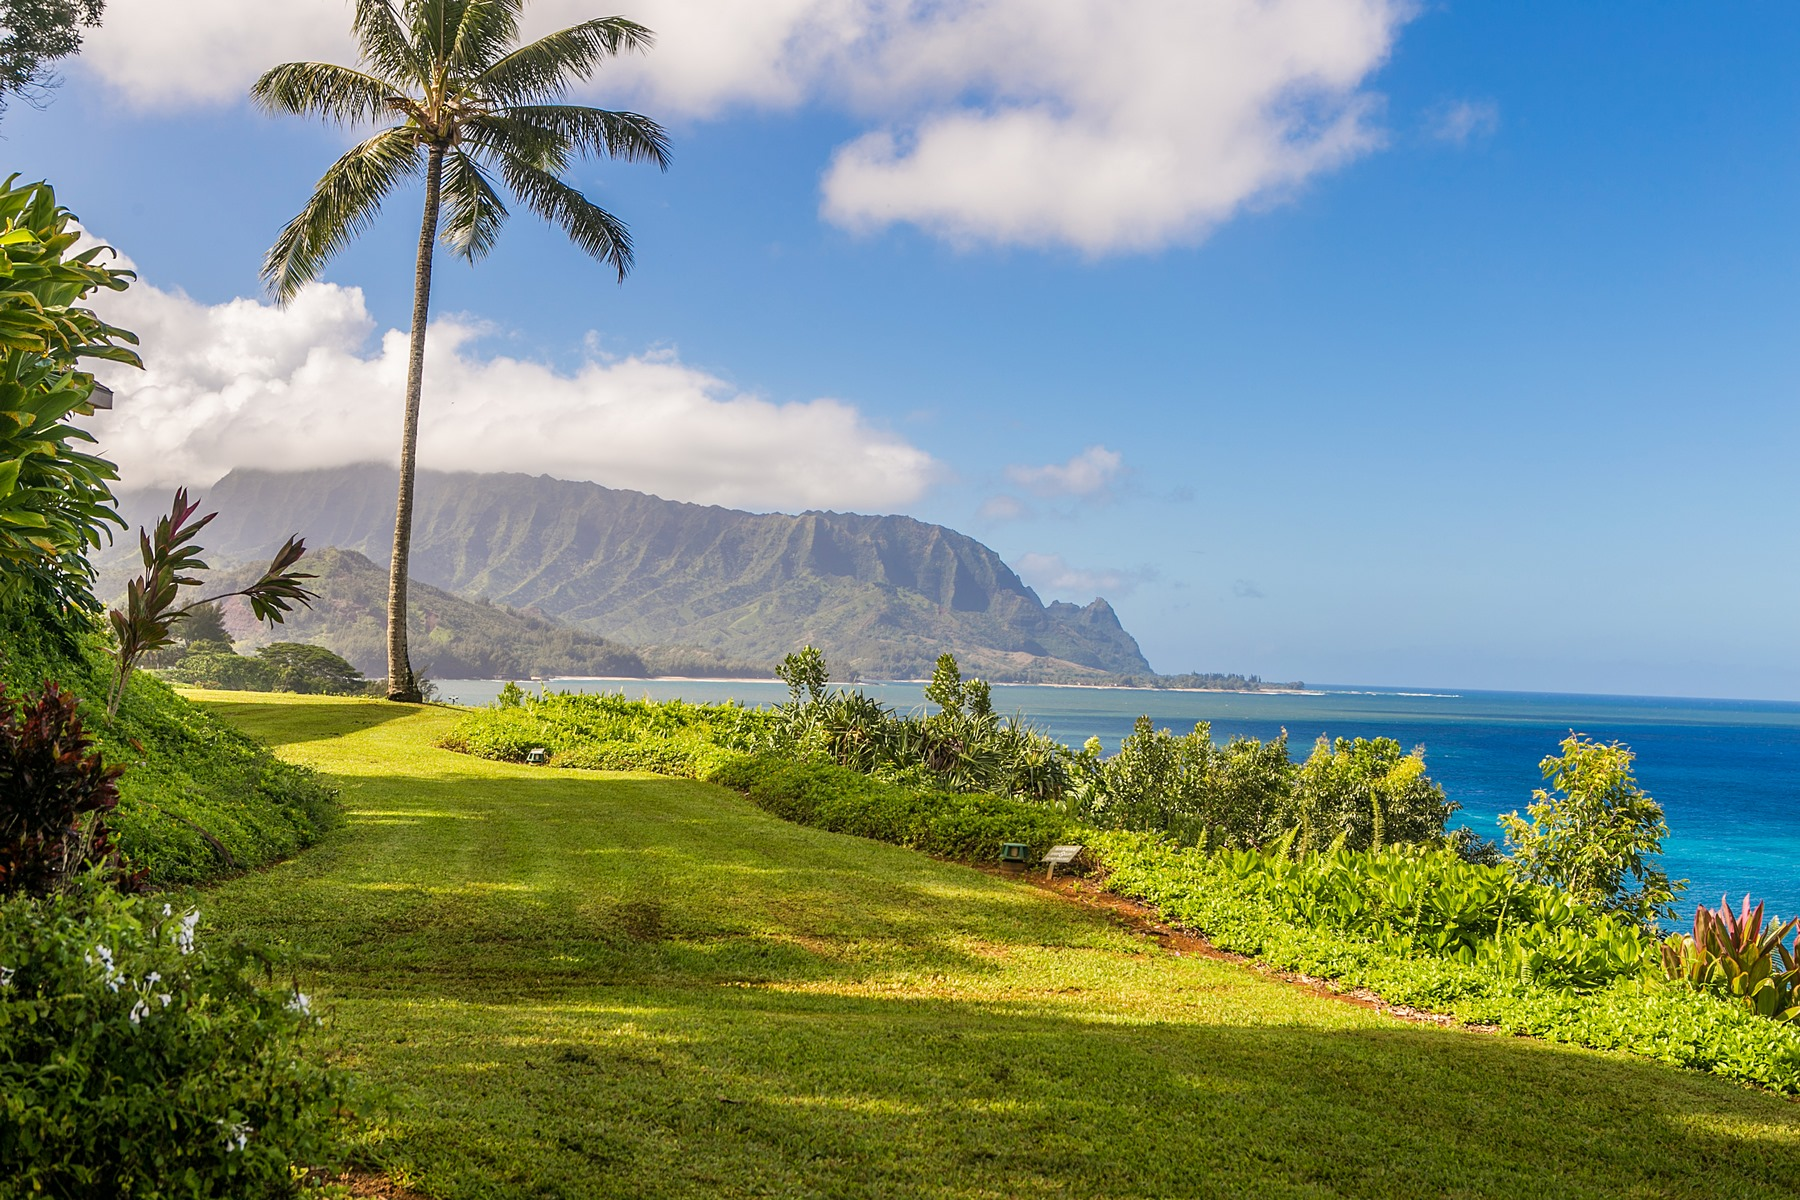 Condominiums for Sale at 5300 KA HAKU RD #119 PRINCEVILLE, HI 96722 5300 KA HAKU RD #119 Princeville, Hawaii 96722 United States